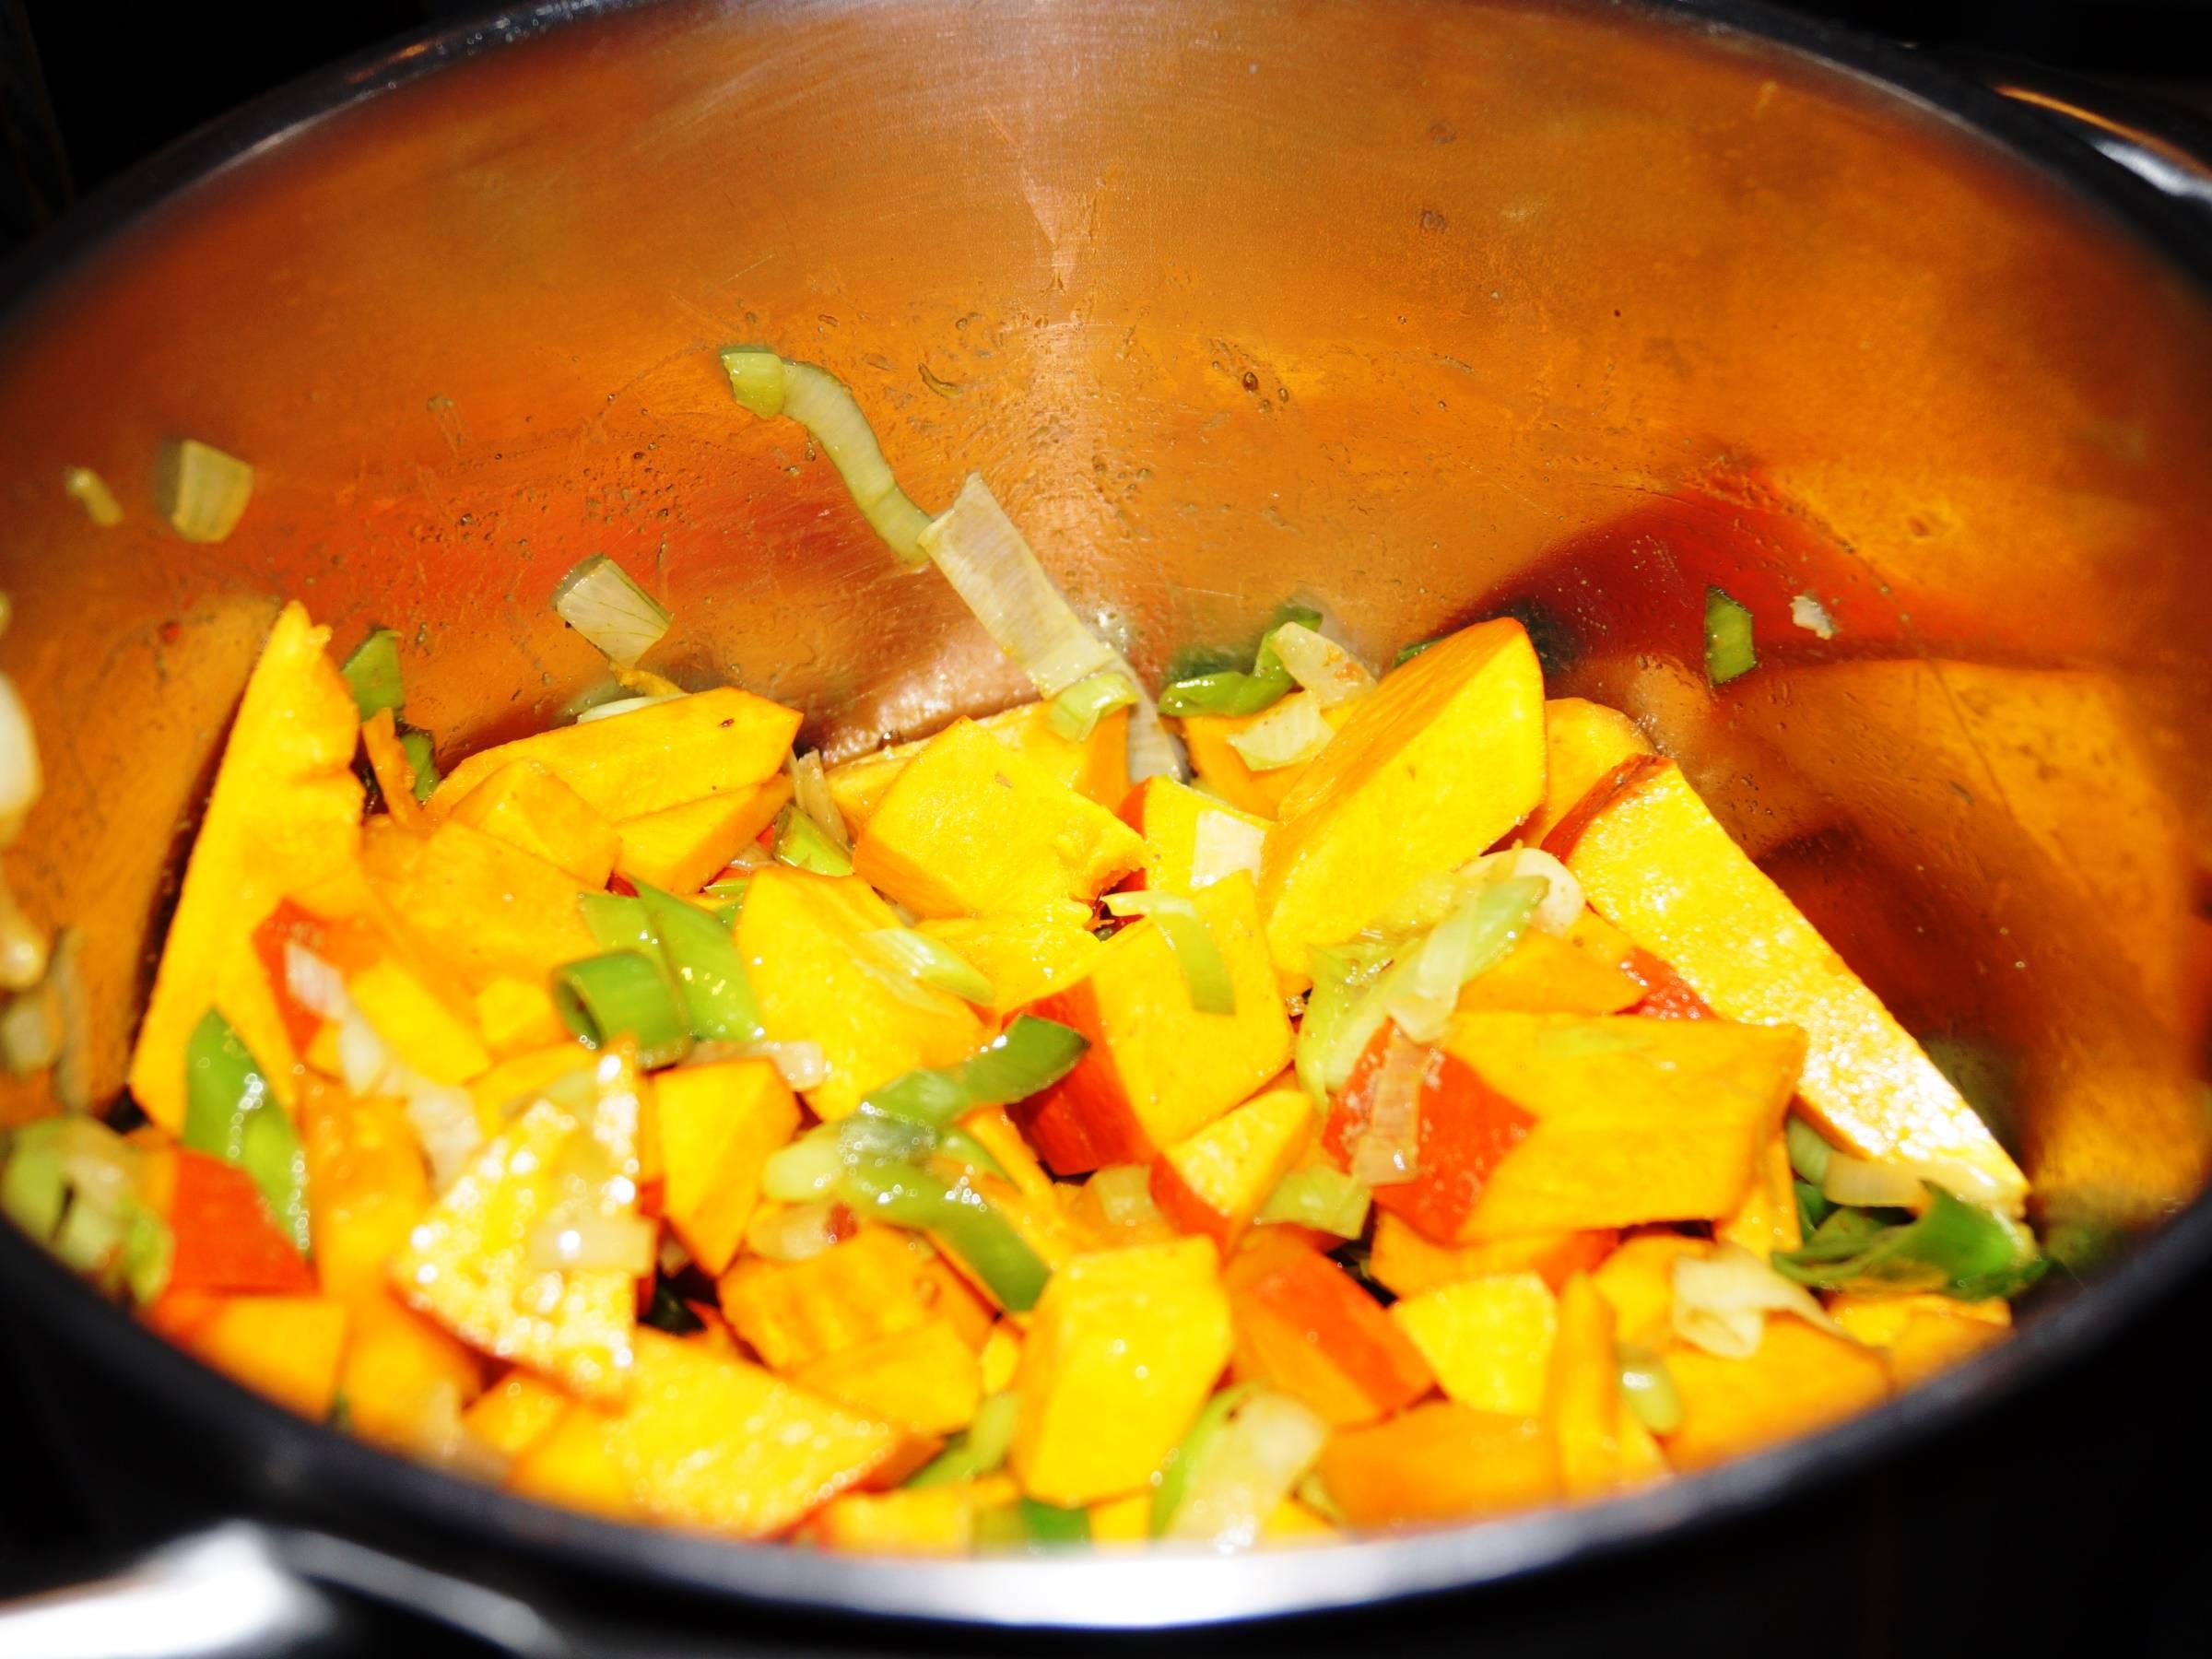 Hokkaido med grøntsager i gryde